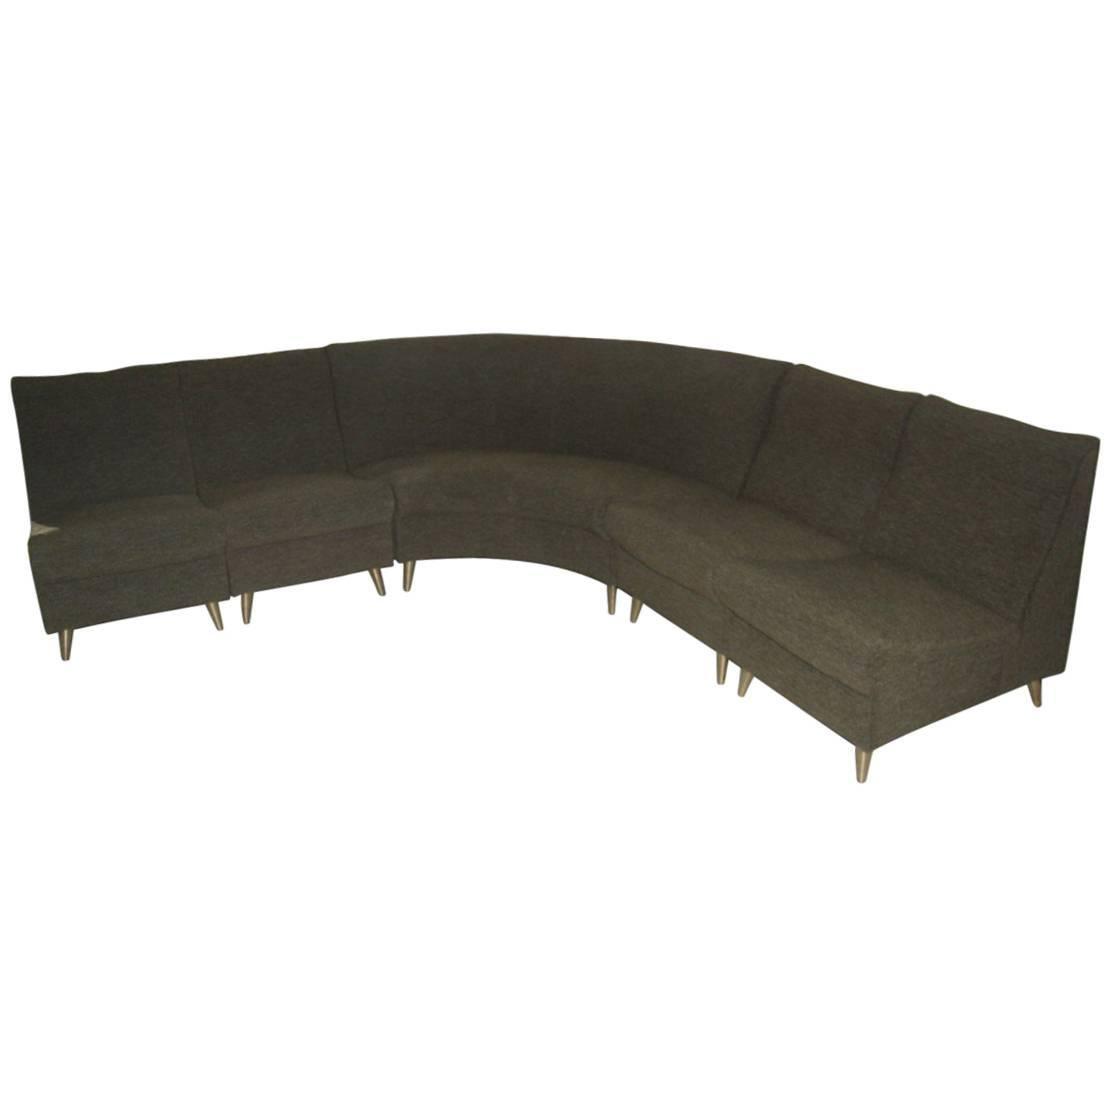 Elegant Modular Curved Sofa Italian Mid-Century Design Zanuso Green Brass Feat